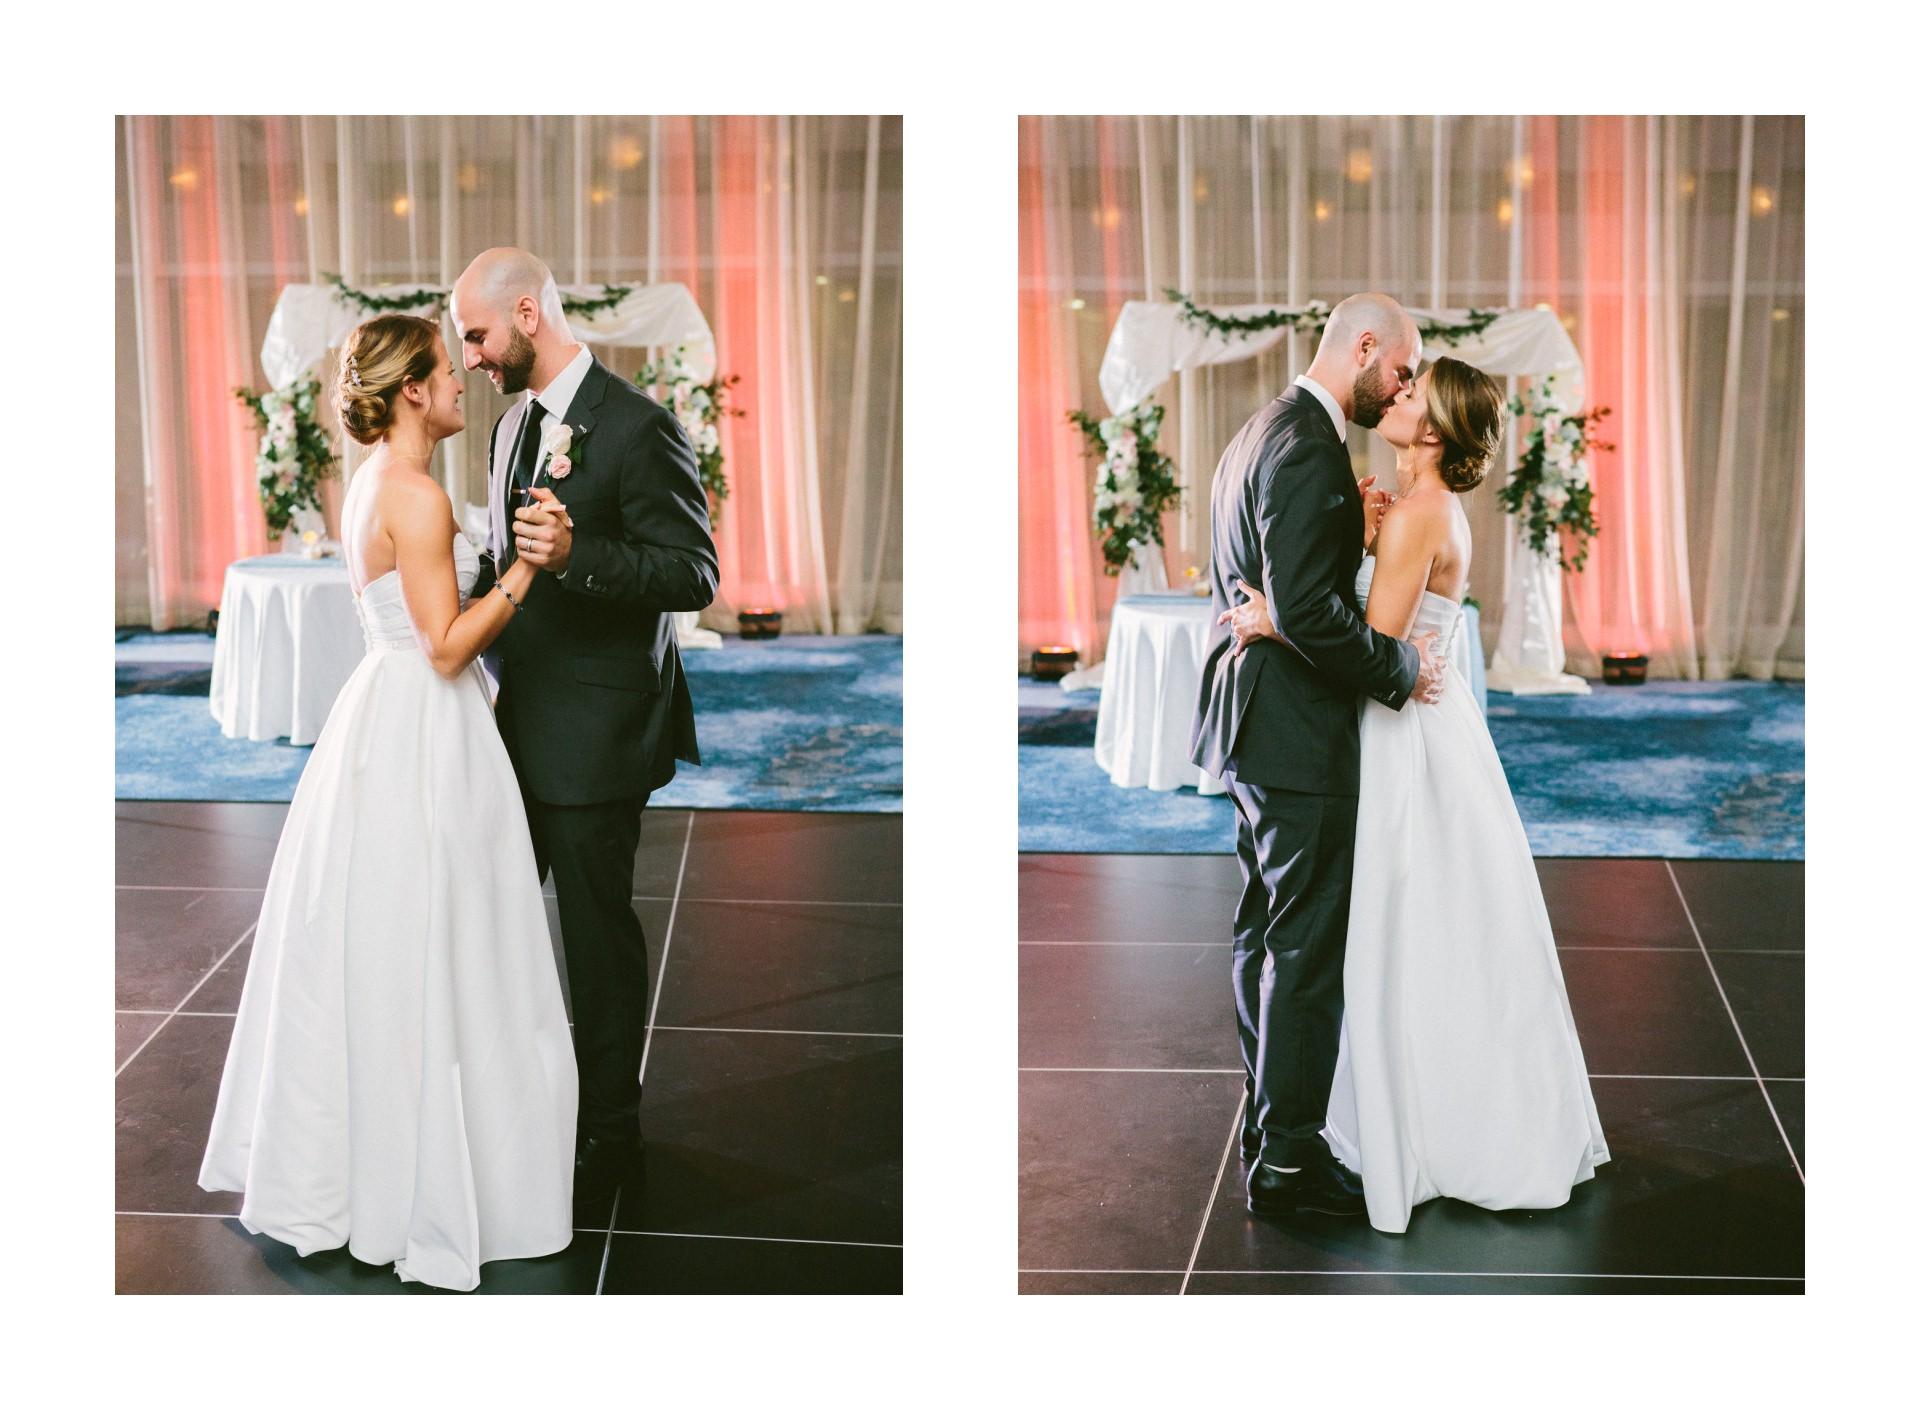 Dowtown Hilton Cleveland Wedding Photographer 2 30.jpg